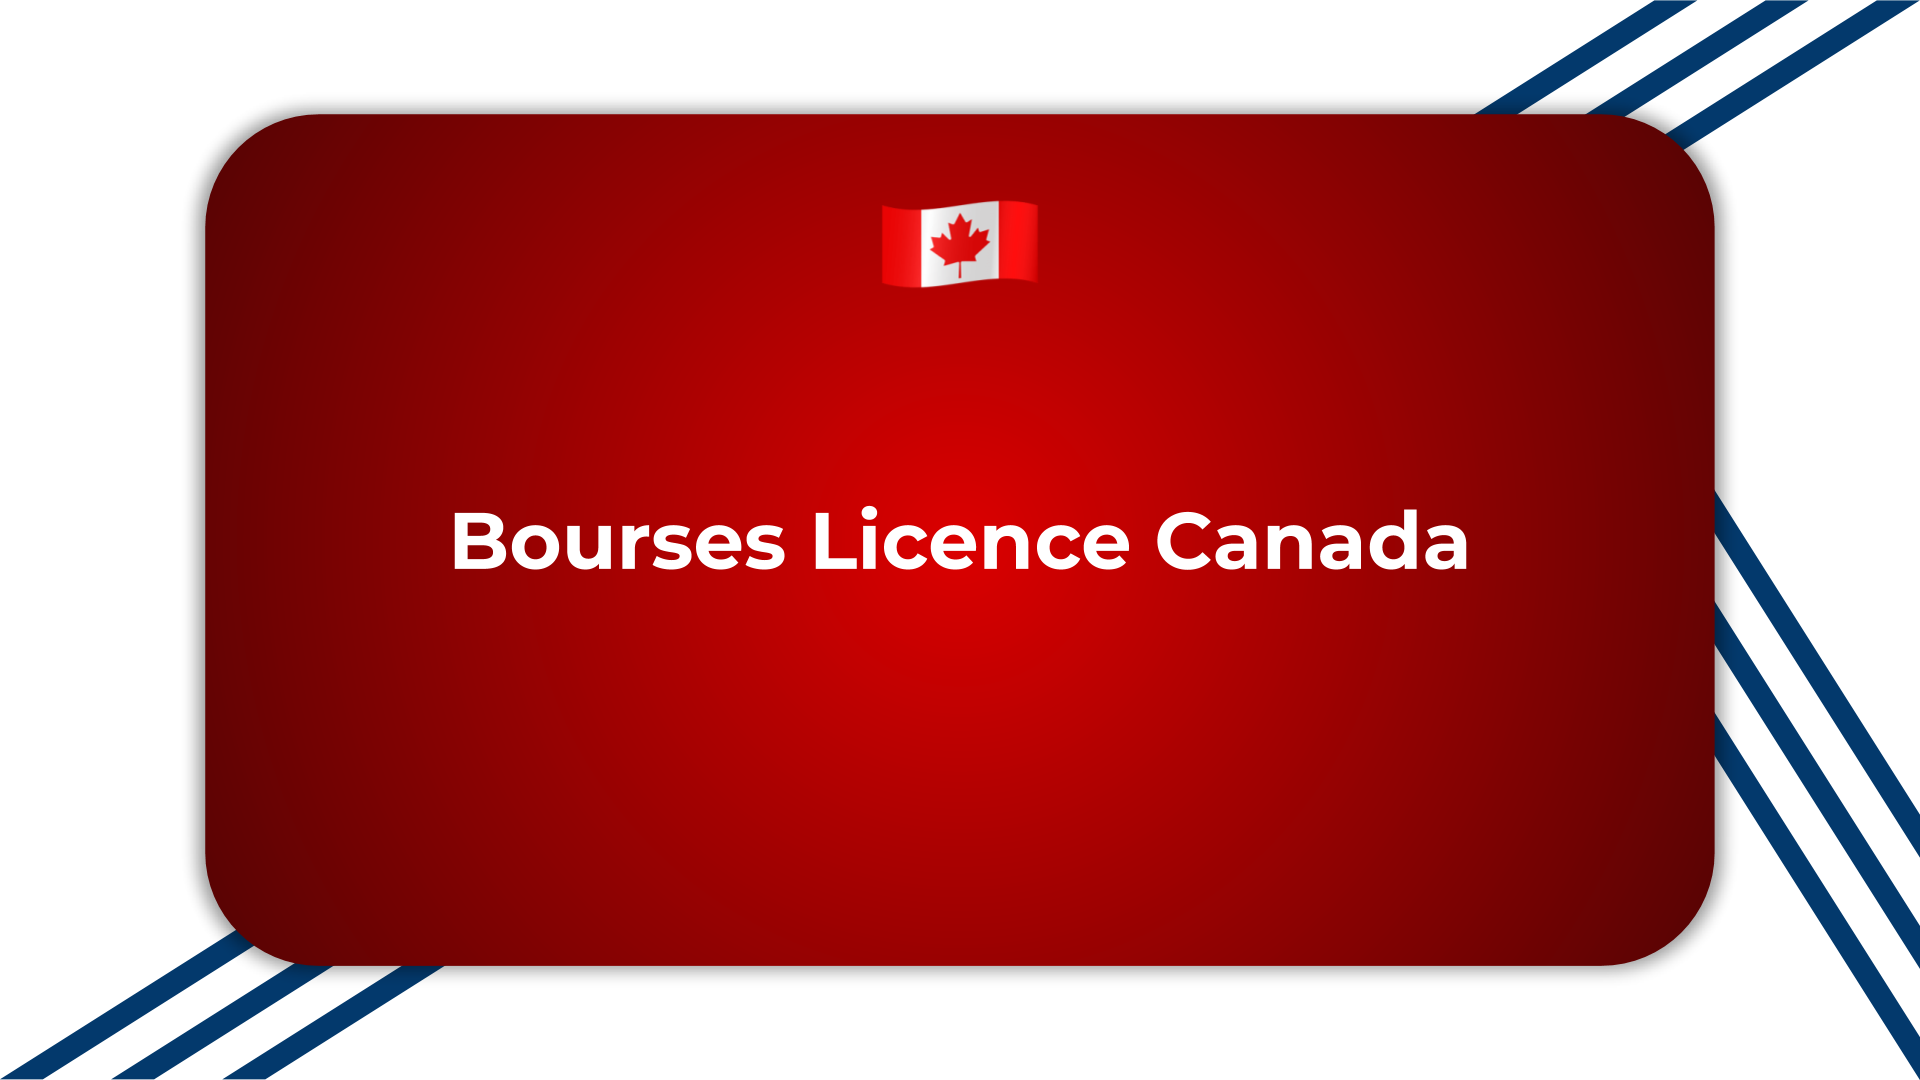 Bourses Licence Canada